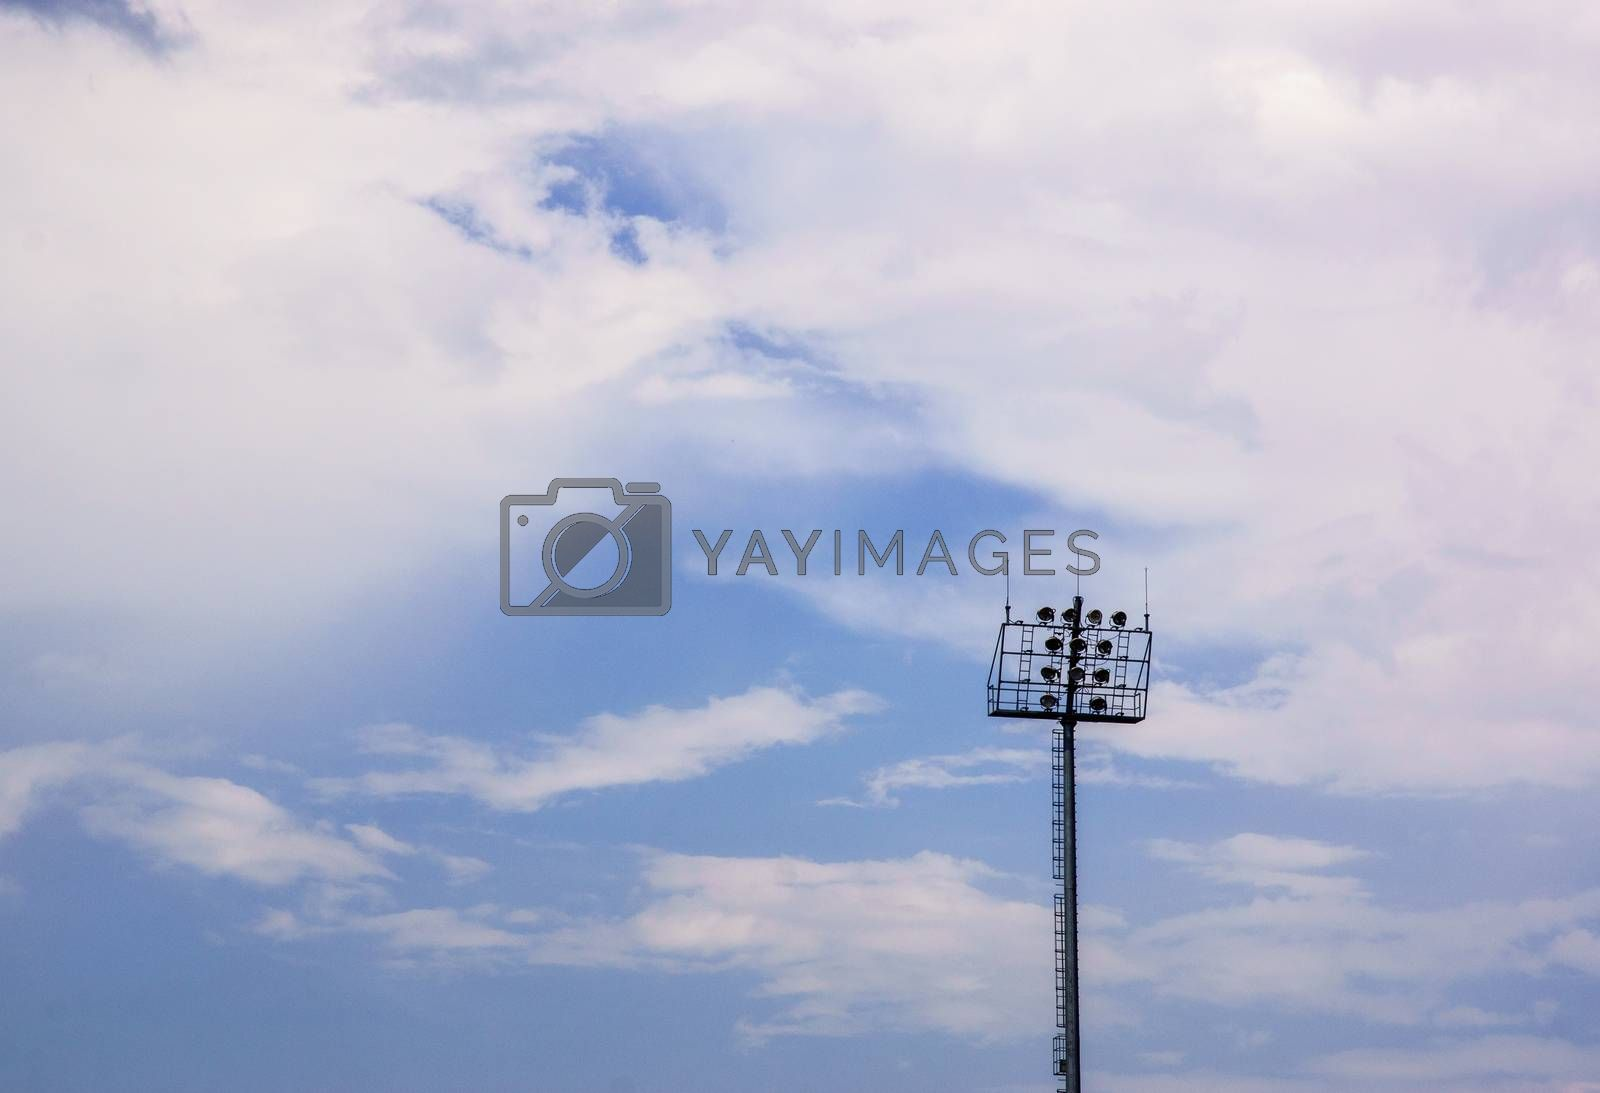 Royalty free image of stadium lamp by nattapatt